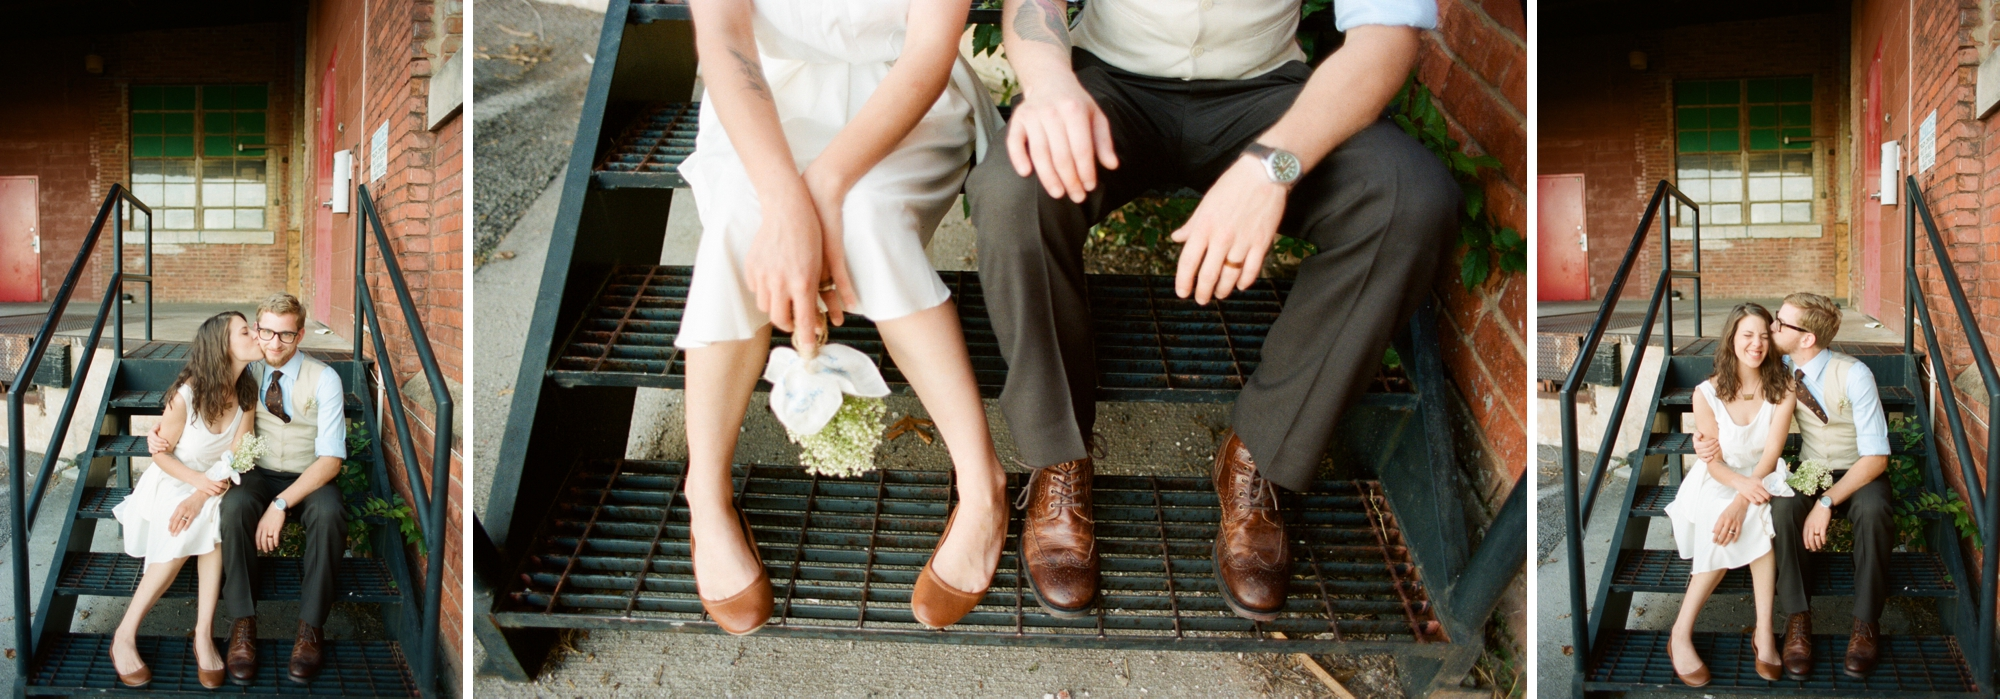 lowe mill wedding photographer_0014